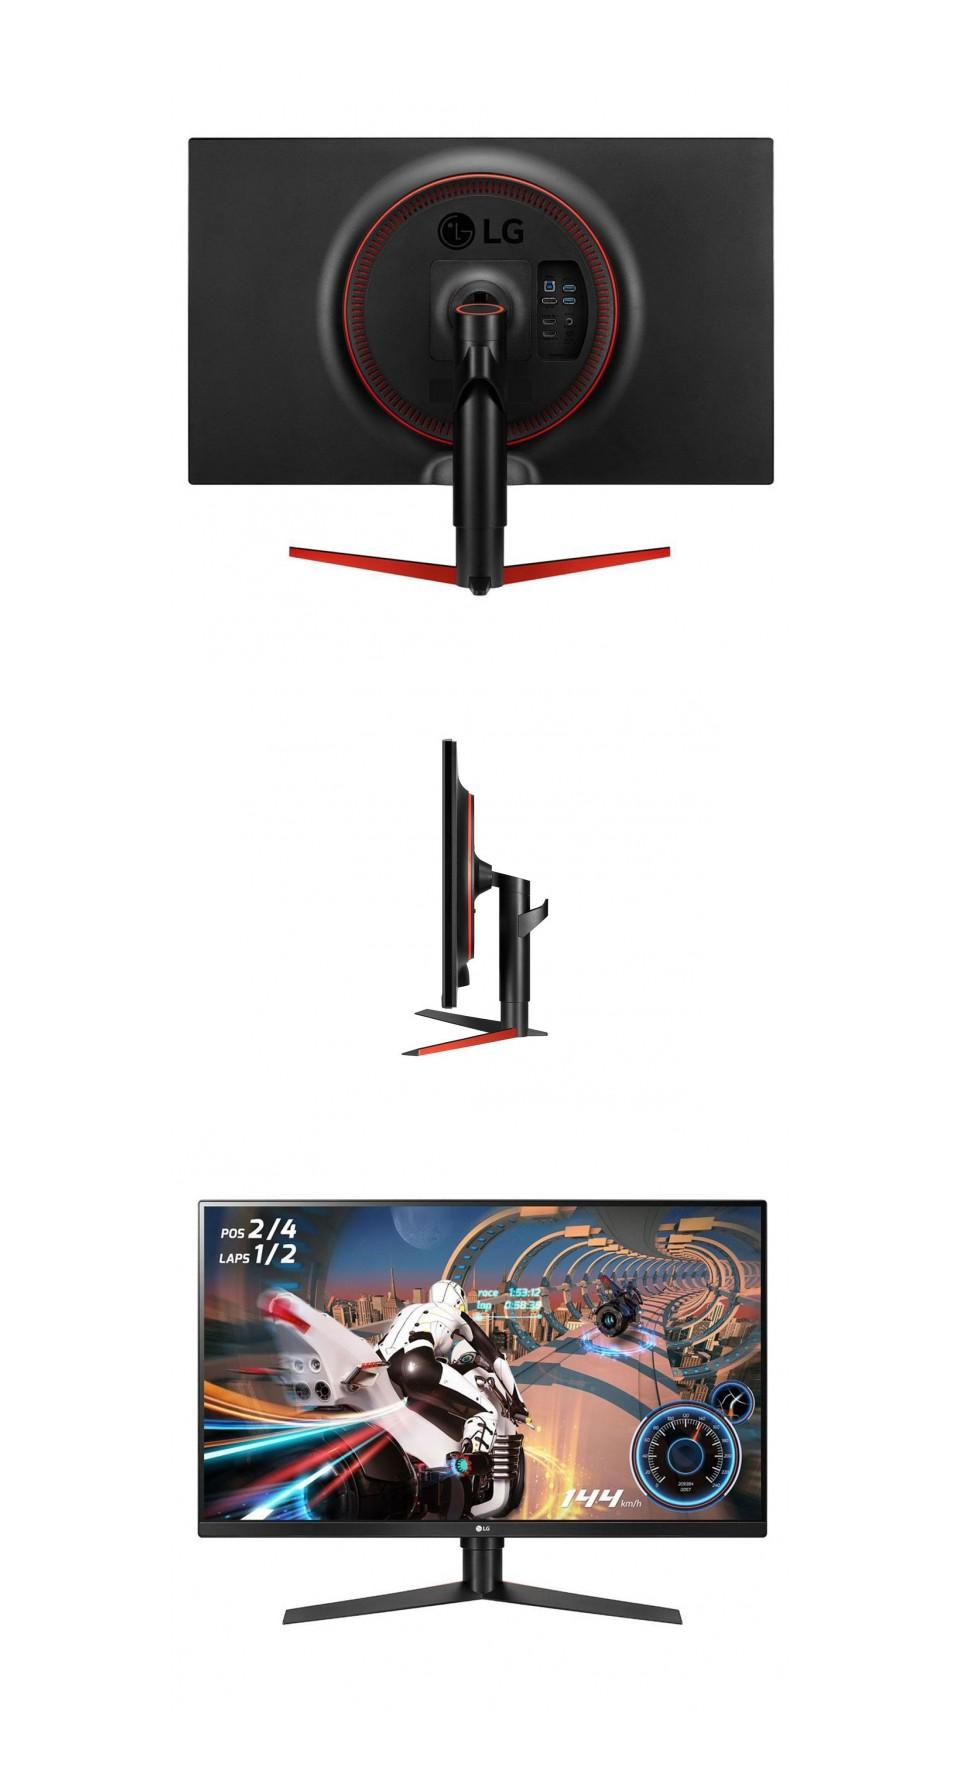 LG UltraGear 144Hz QHD 32in Monitor product